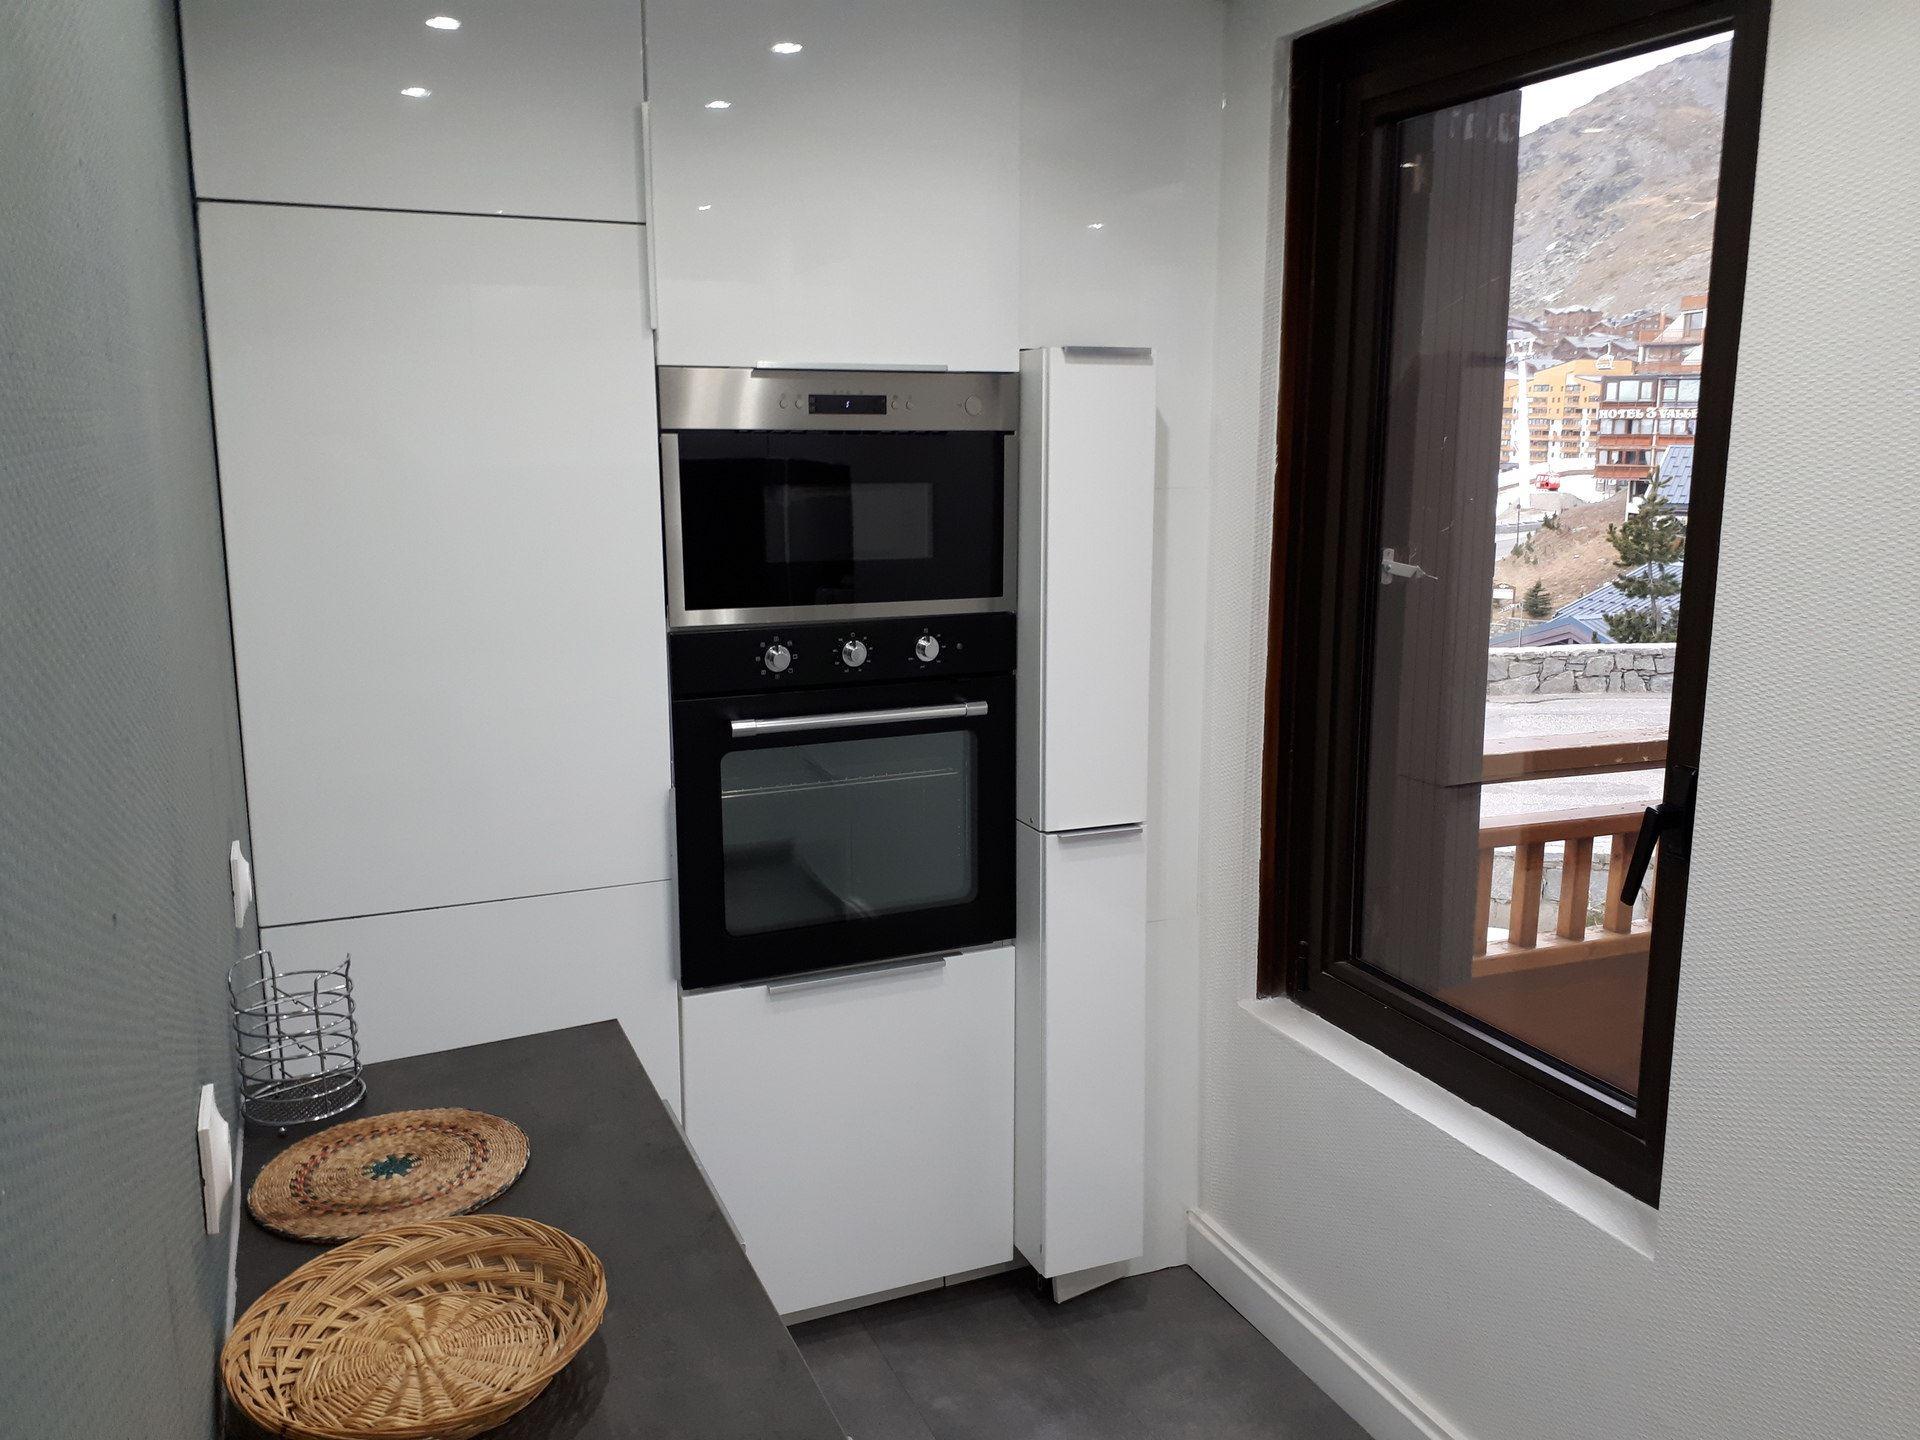 HAUTS DE CHAVIERE 4 / 4 ROOMS 8 PERSONS - 2 BRONZE SNOWFLAKES – VTI